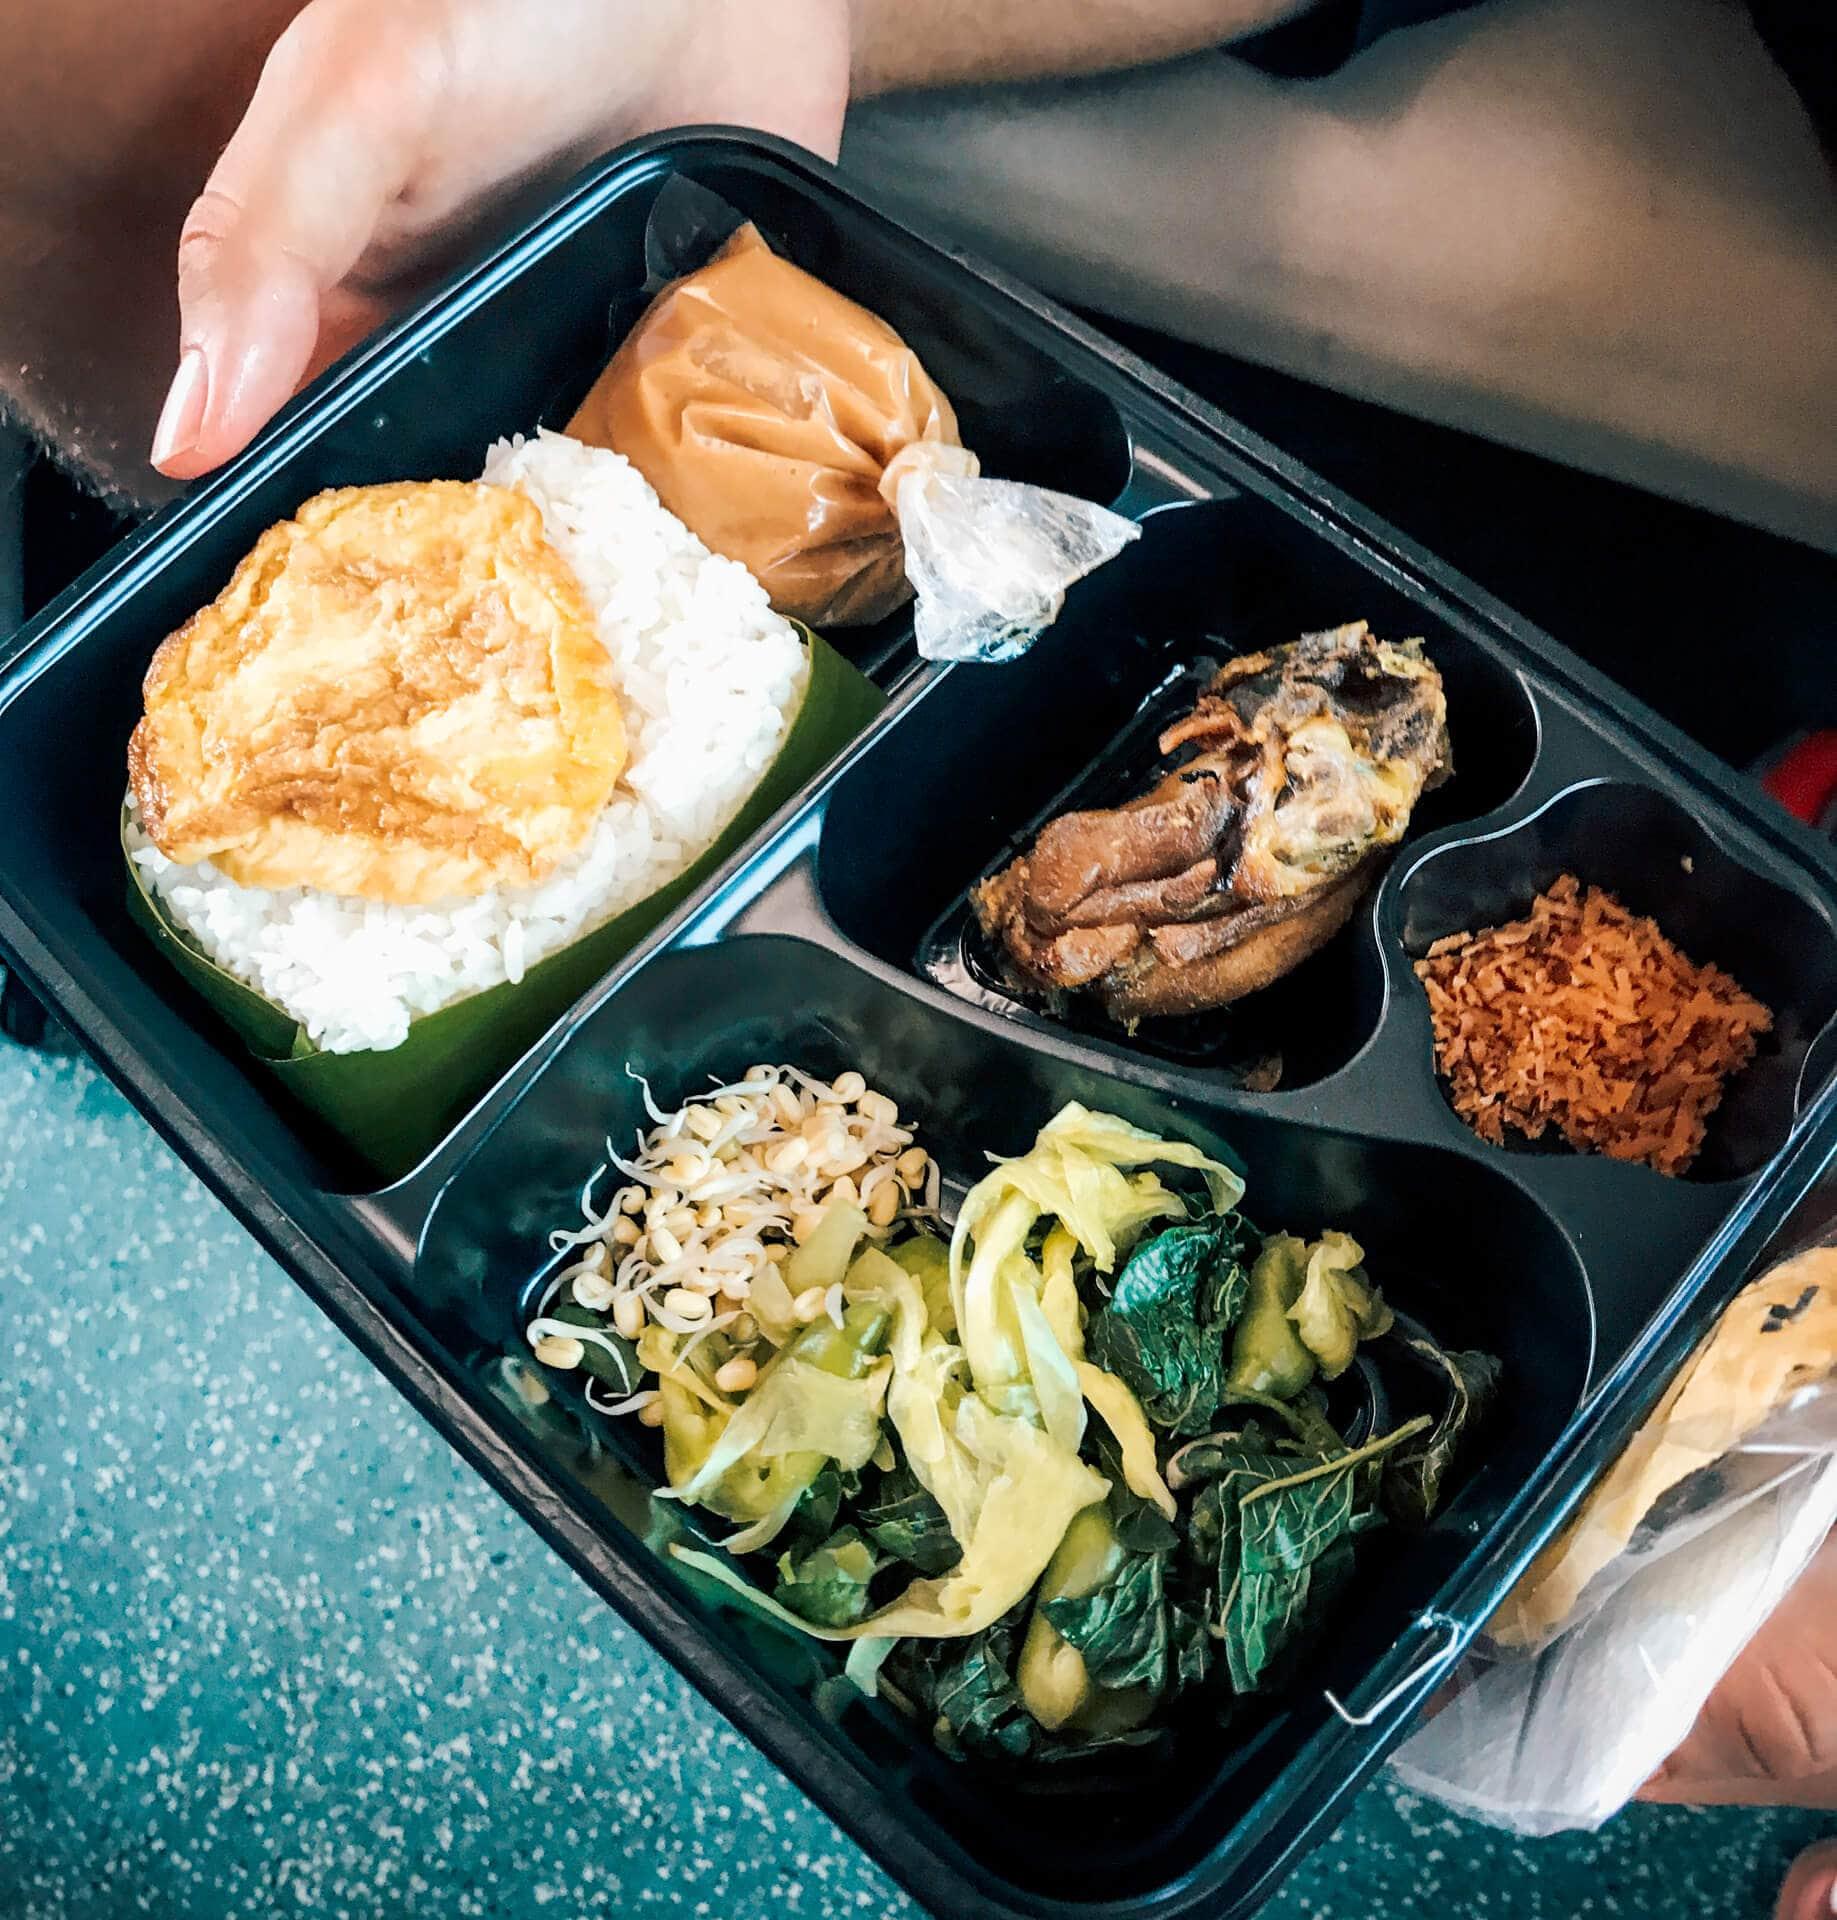 malioboro train yogyakarta malang food